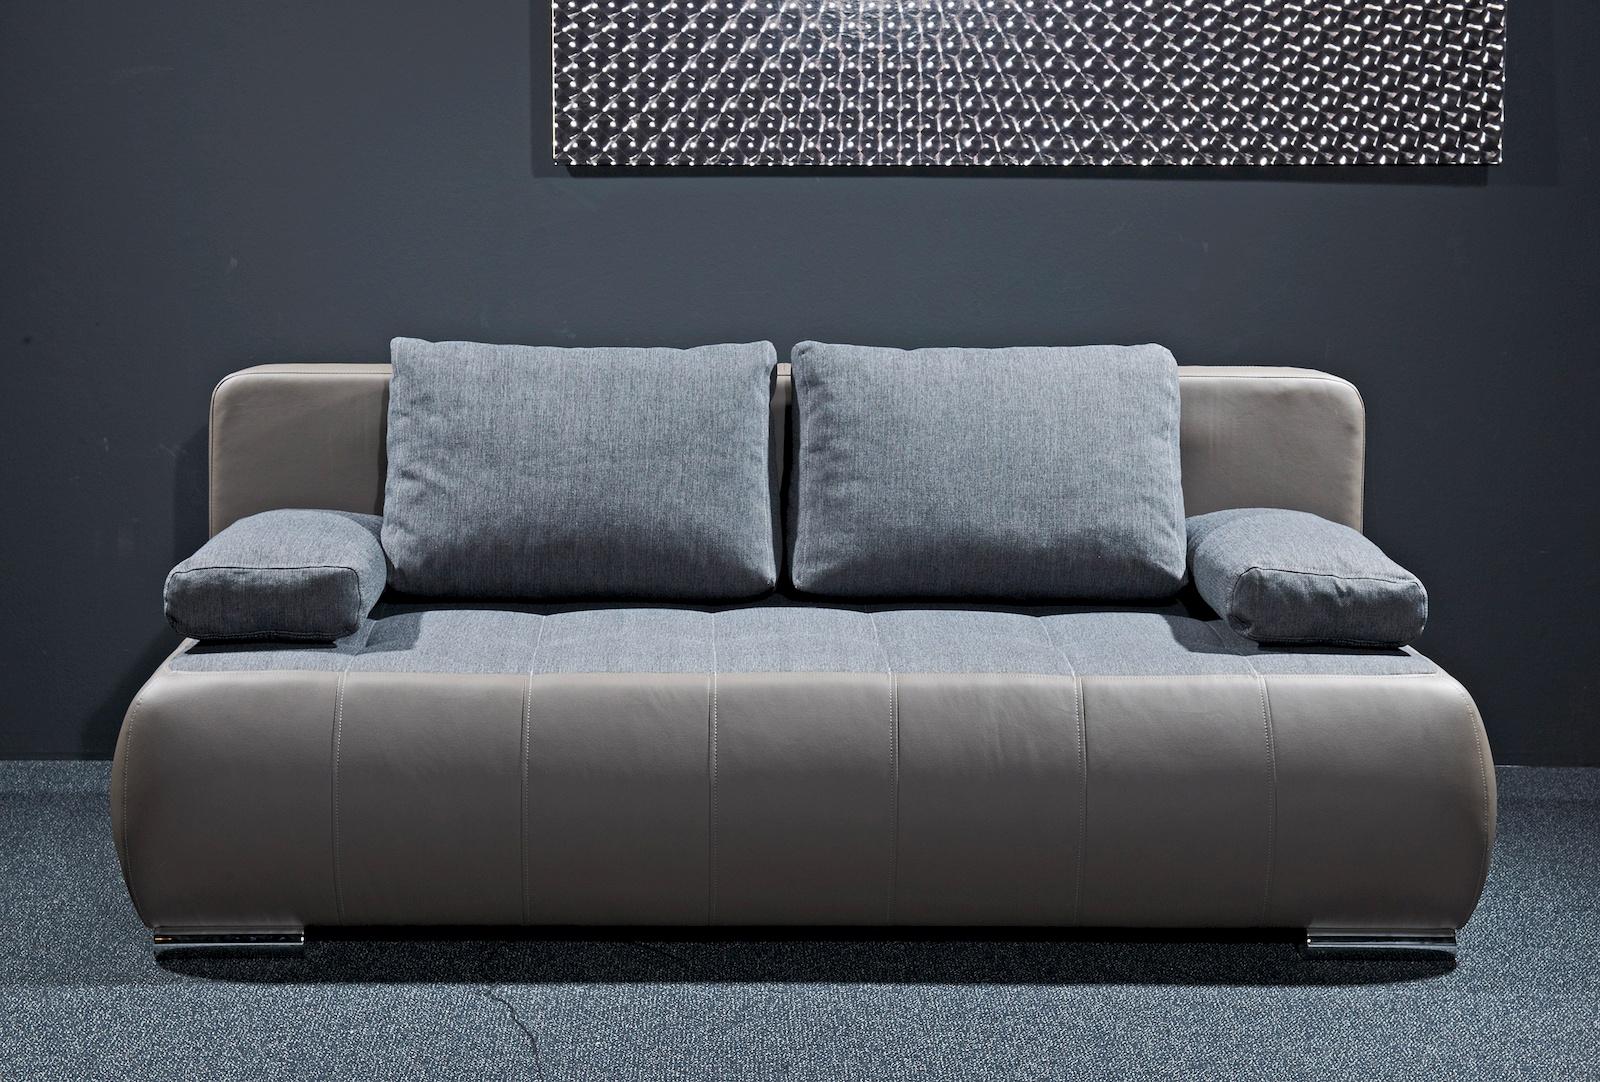 sonderpreis schlafsofa ohio couch sofa lederoptik schlafcouch bettsofa polsterm bel. Black Bedroom Furniture Sets. Home Design Ideas